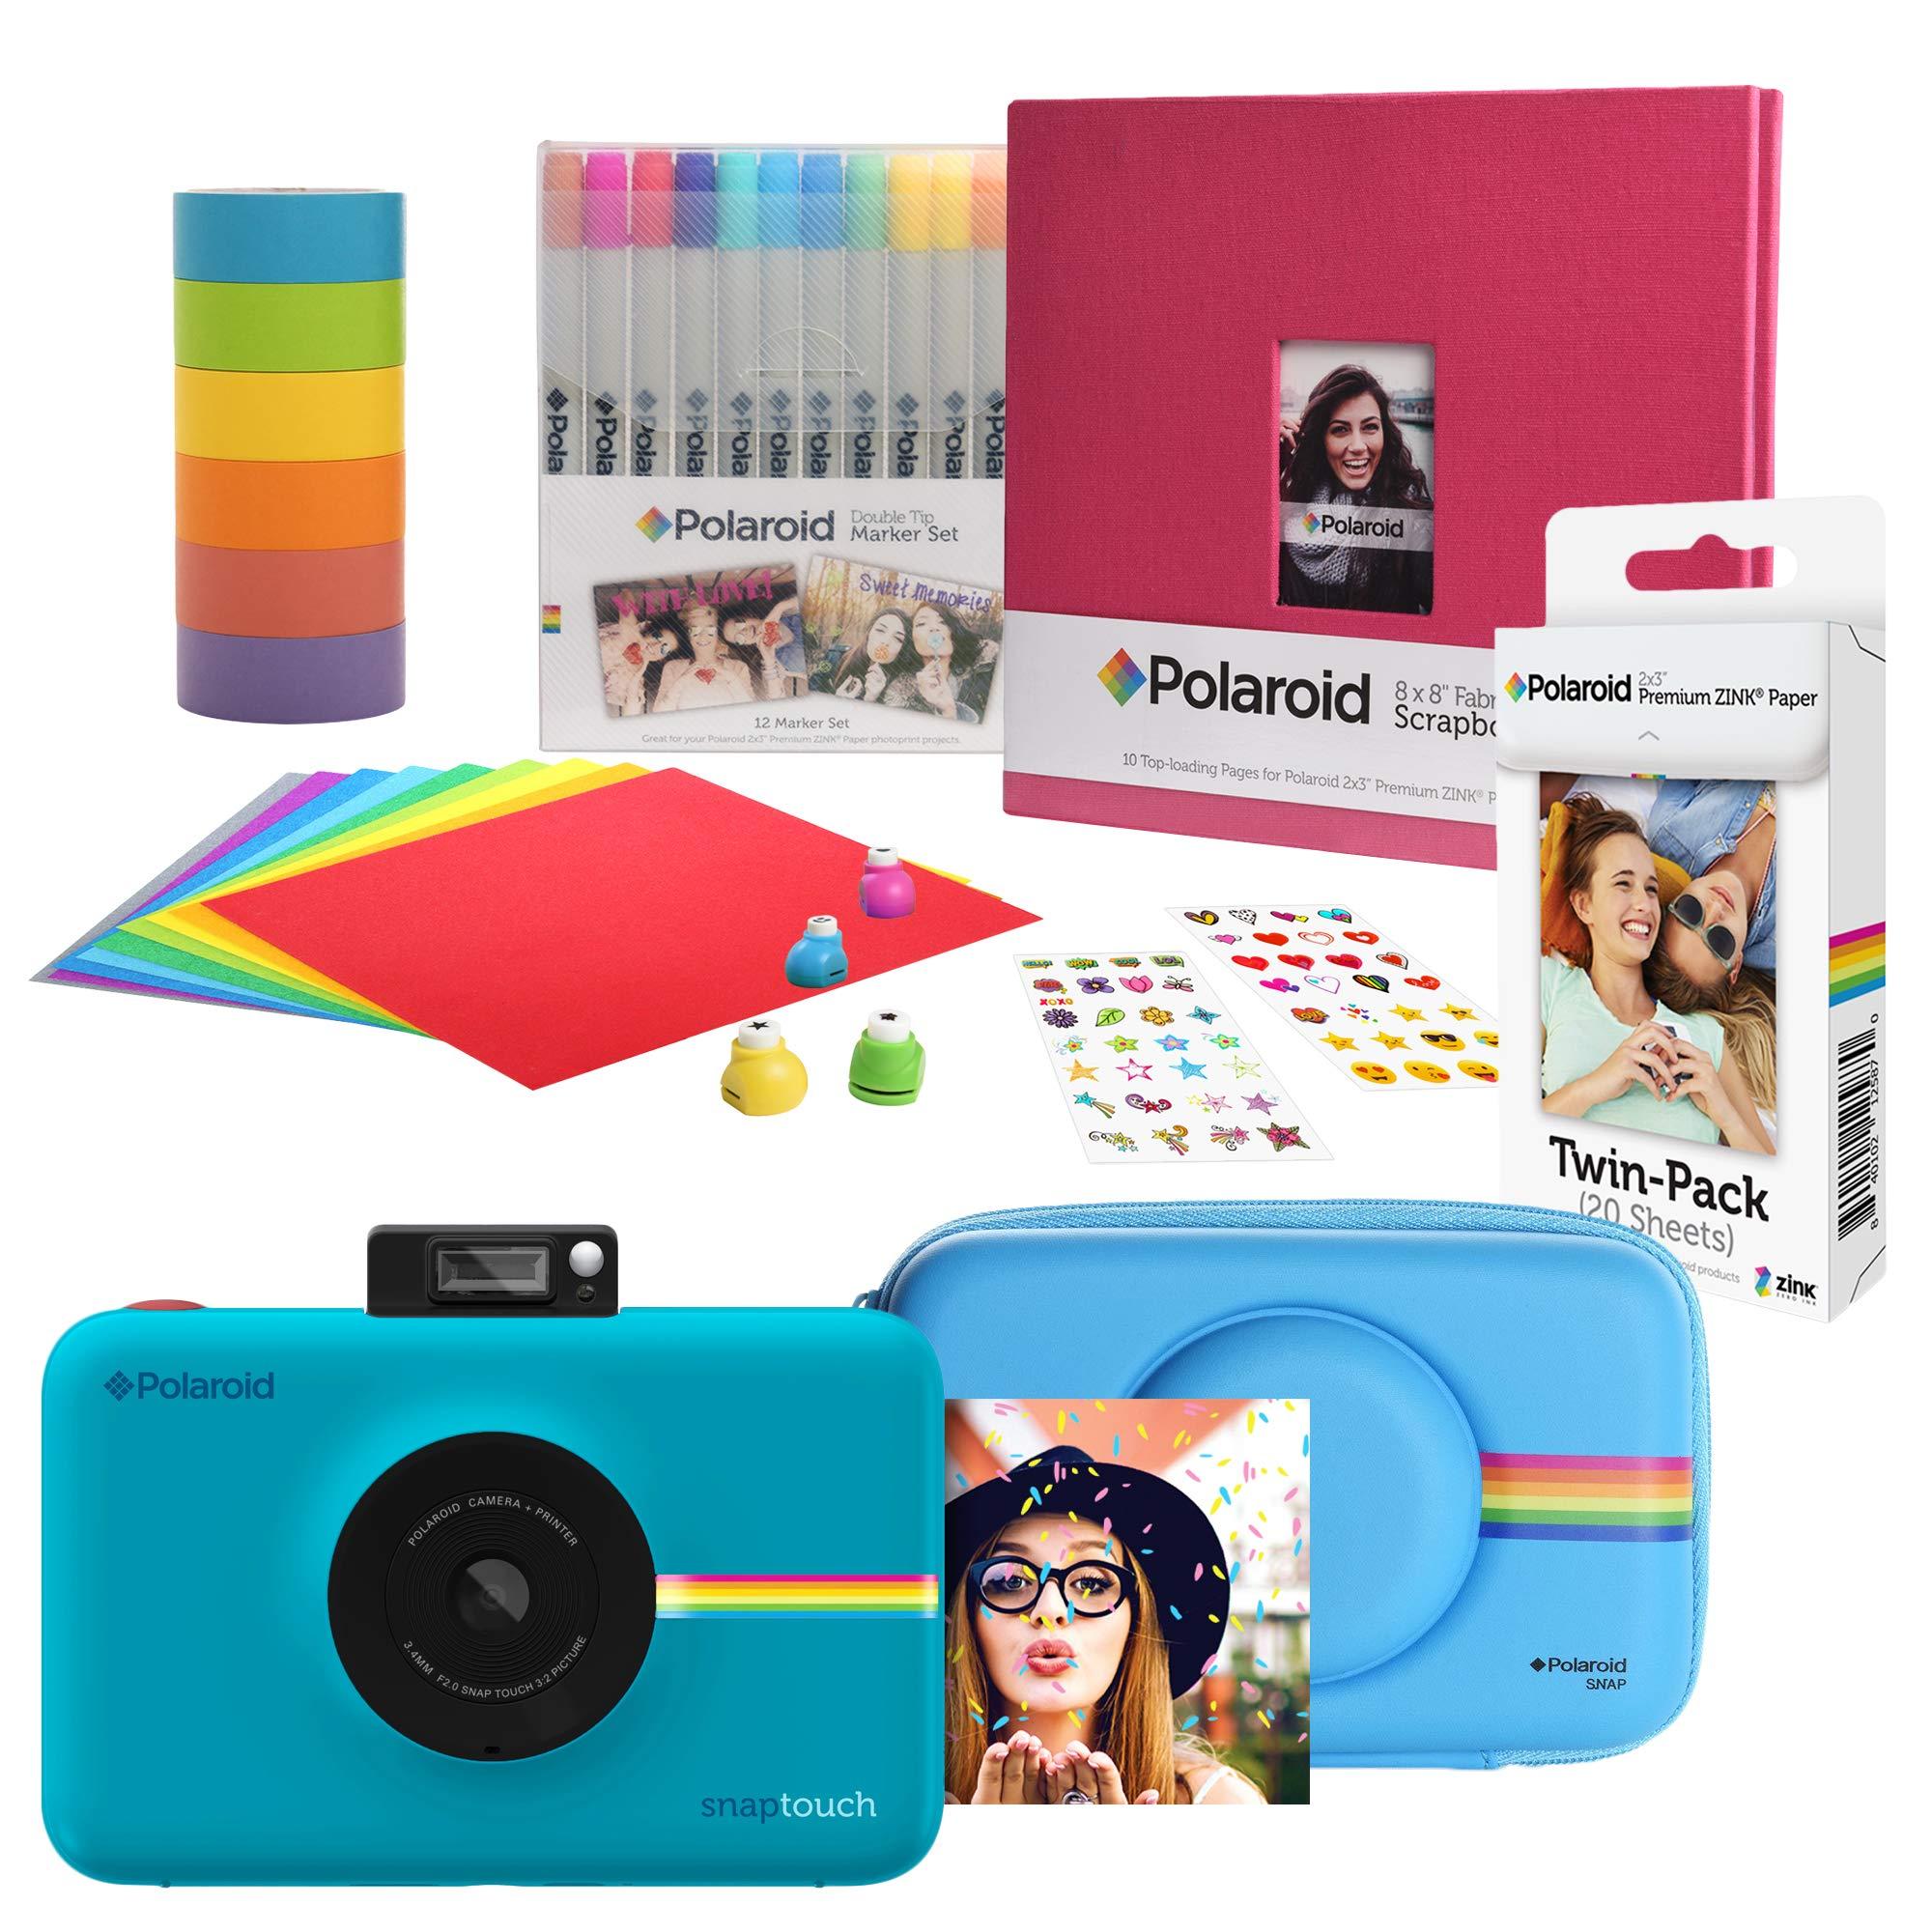 Polaroid Snap Touch Instant Digital Camera (Blue) Scrapbook Kit with Eva Case by Polaroid